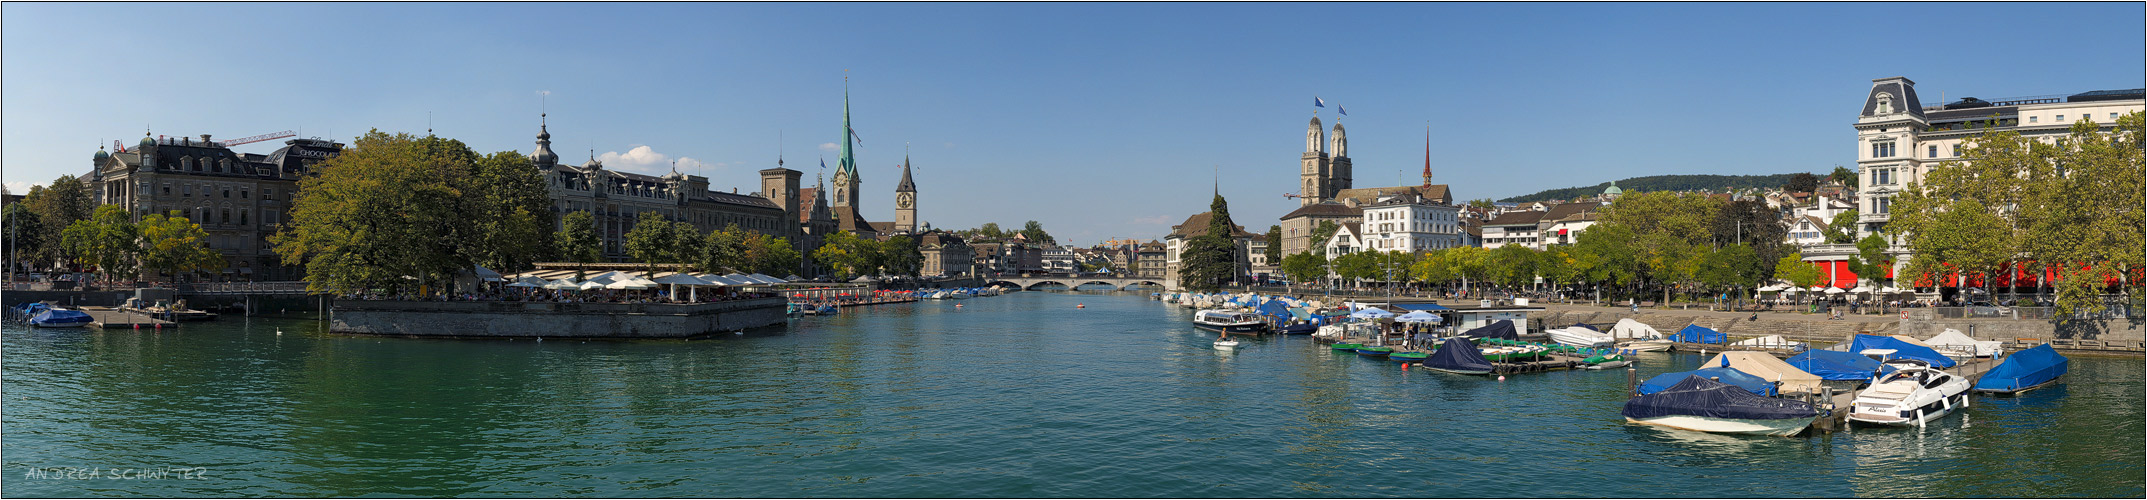 Zürich III - Panorama